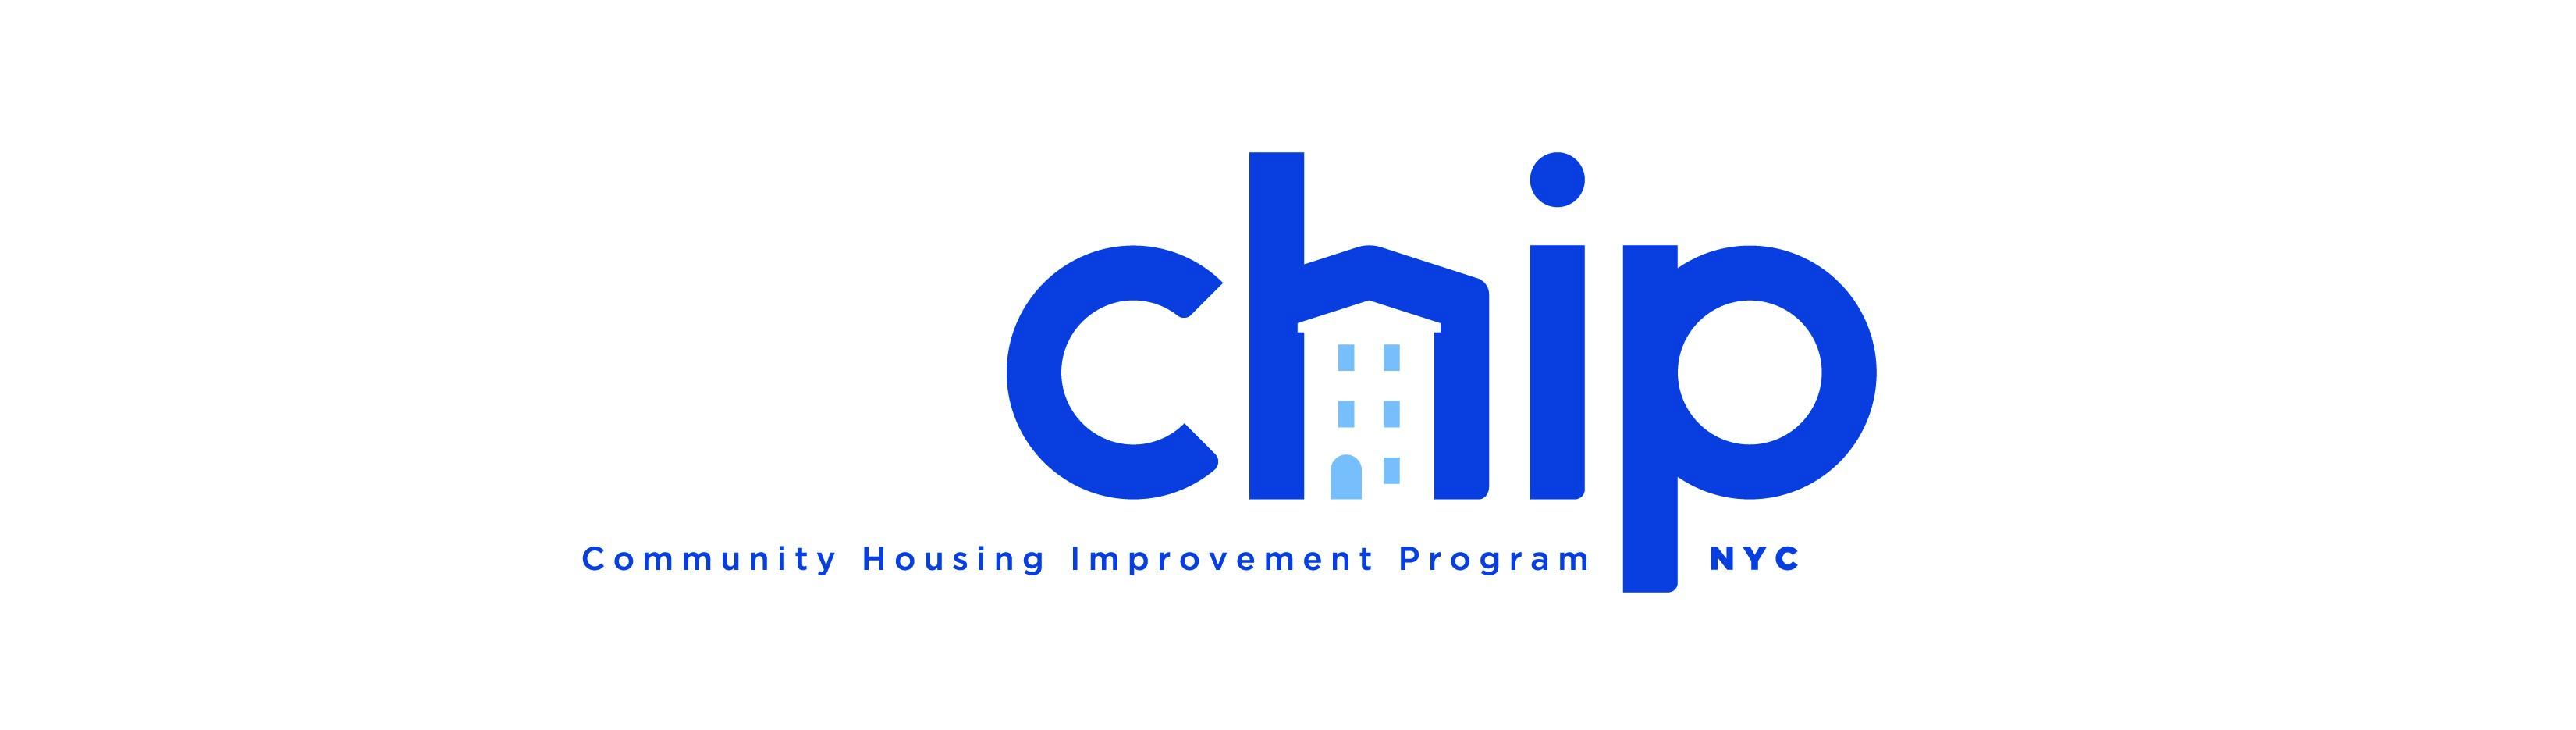 CHIP - Community Housing Improvement Program